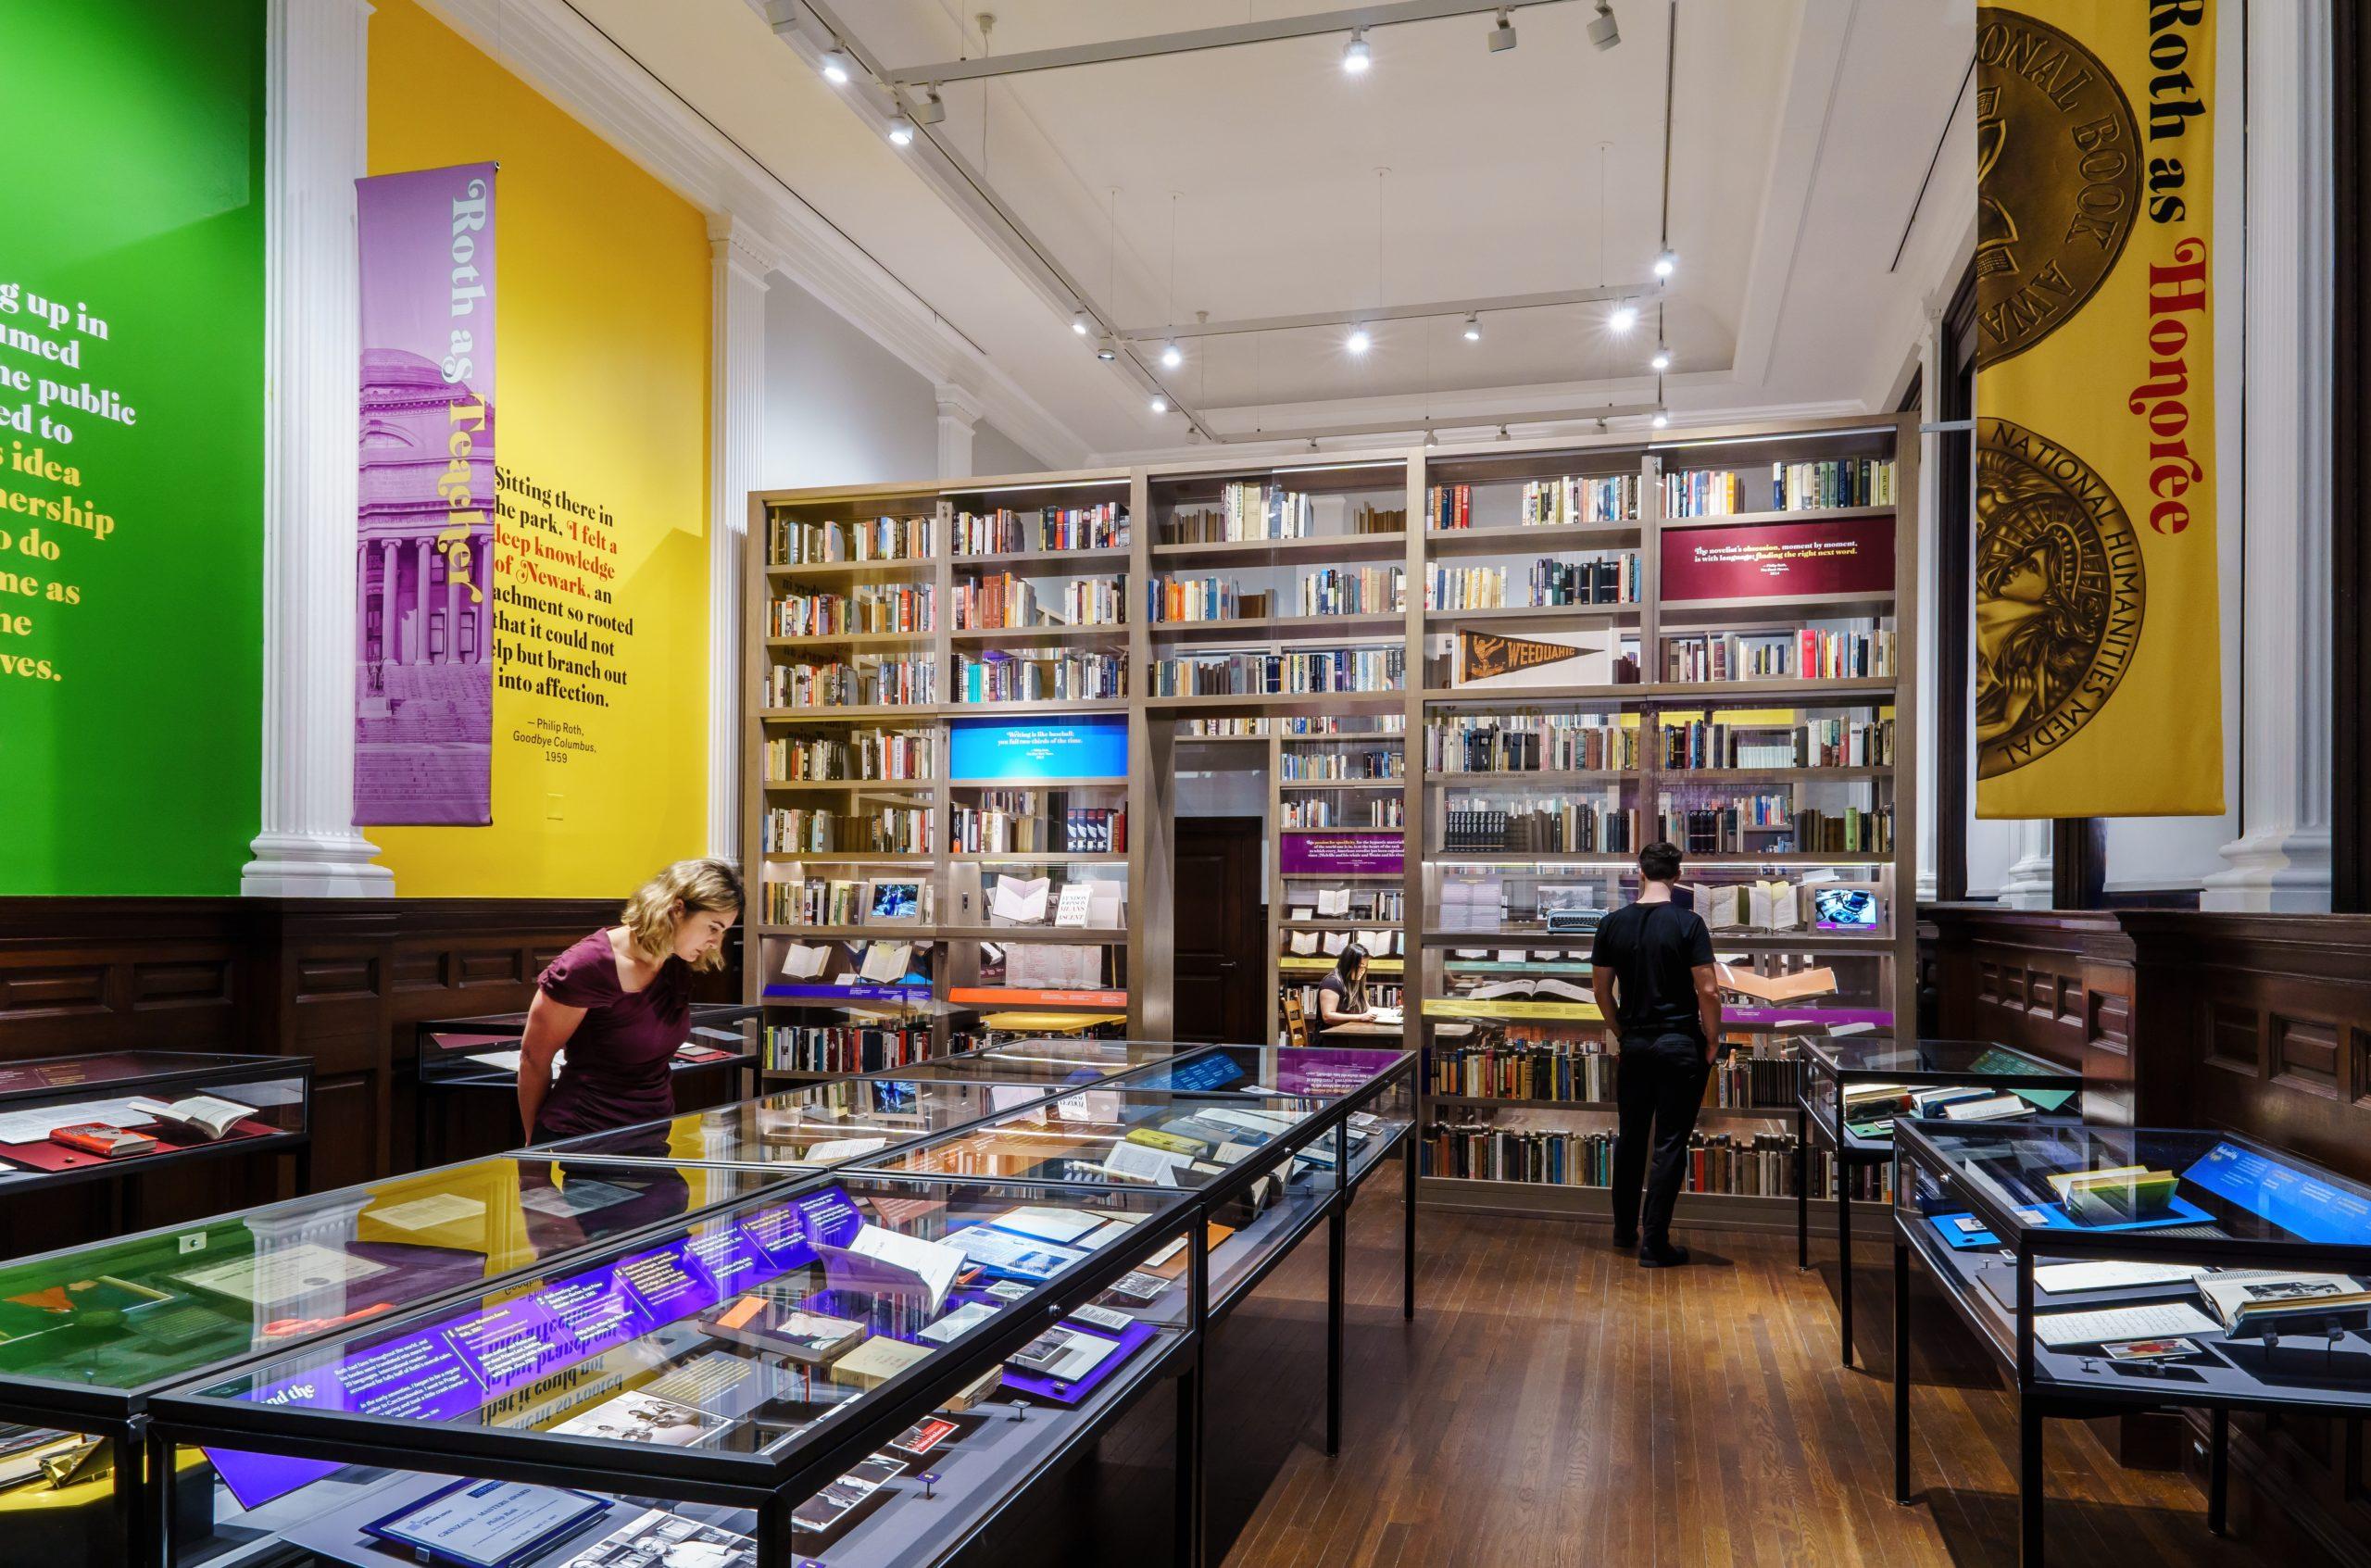 Philip Roth Library Design